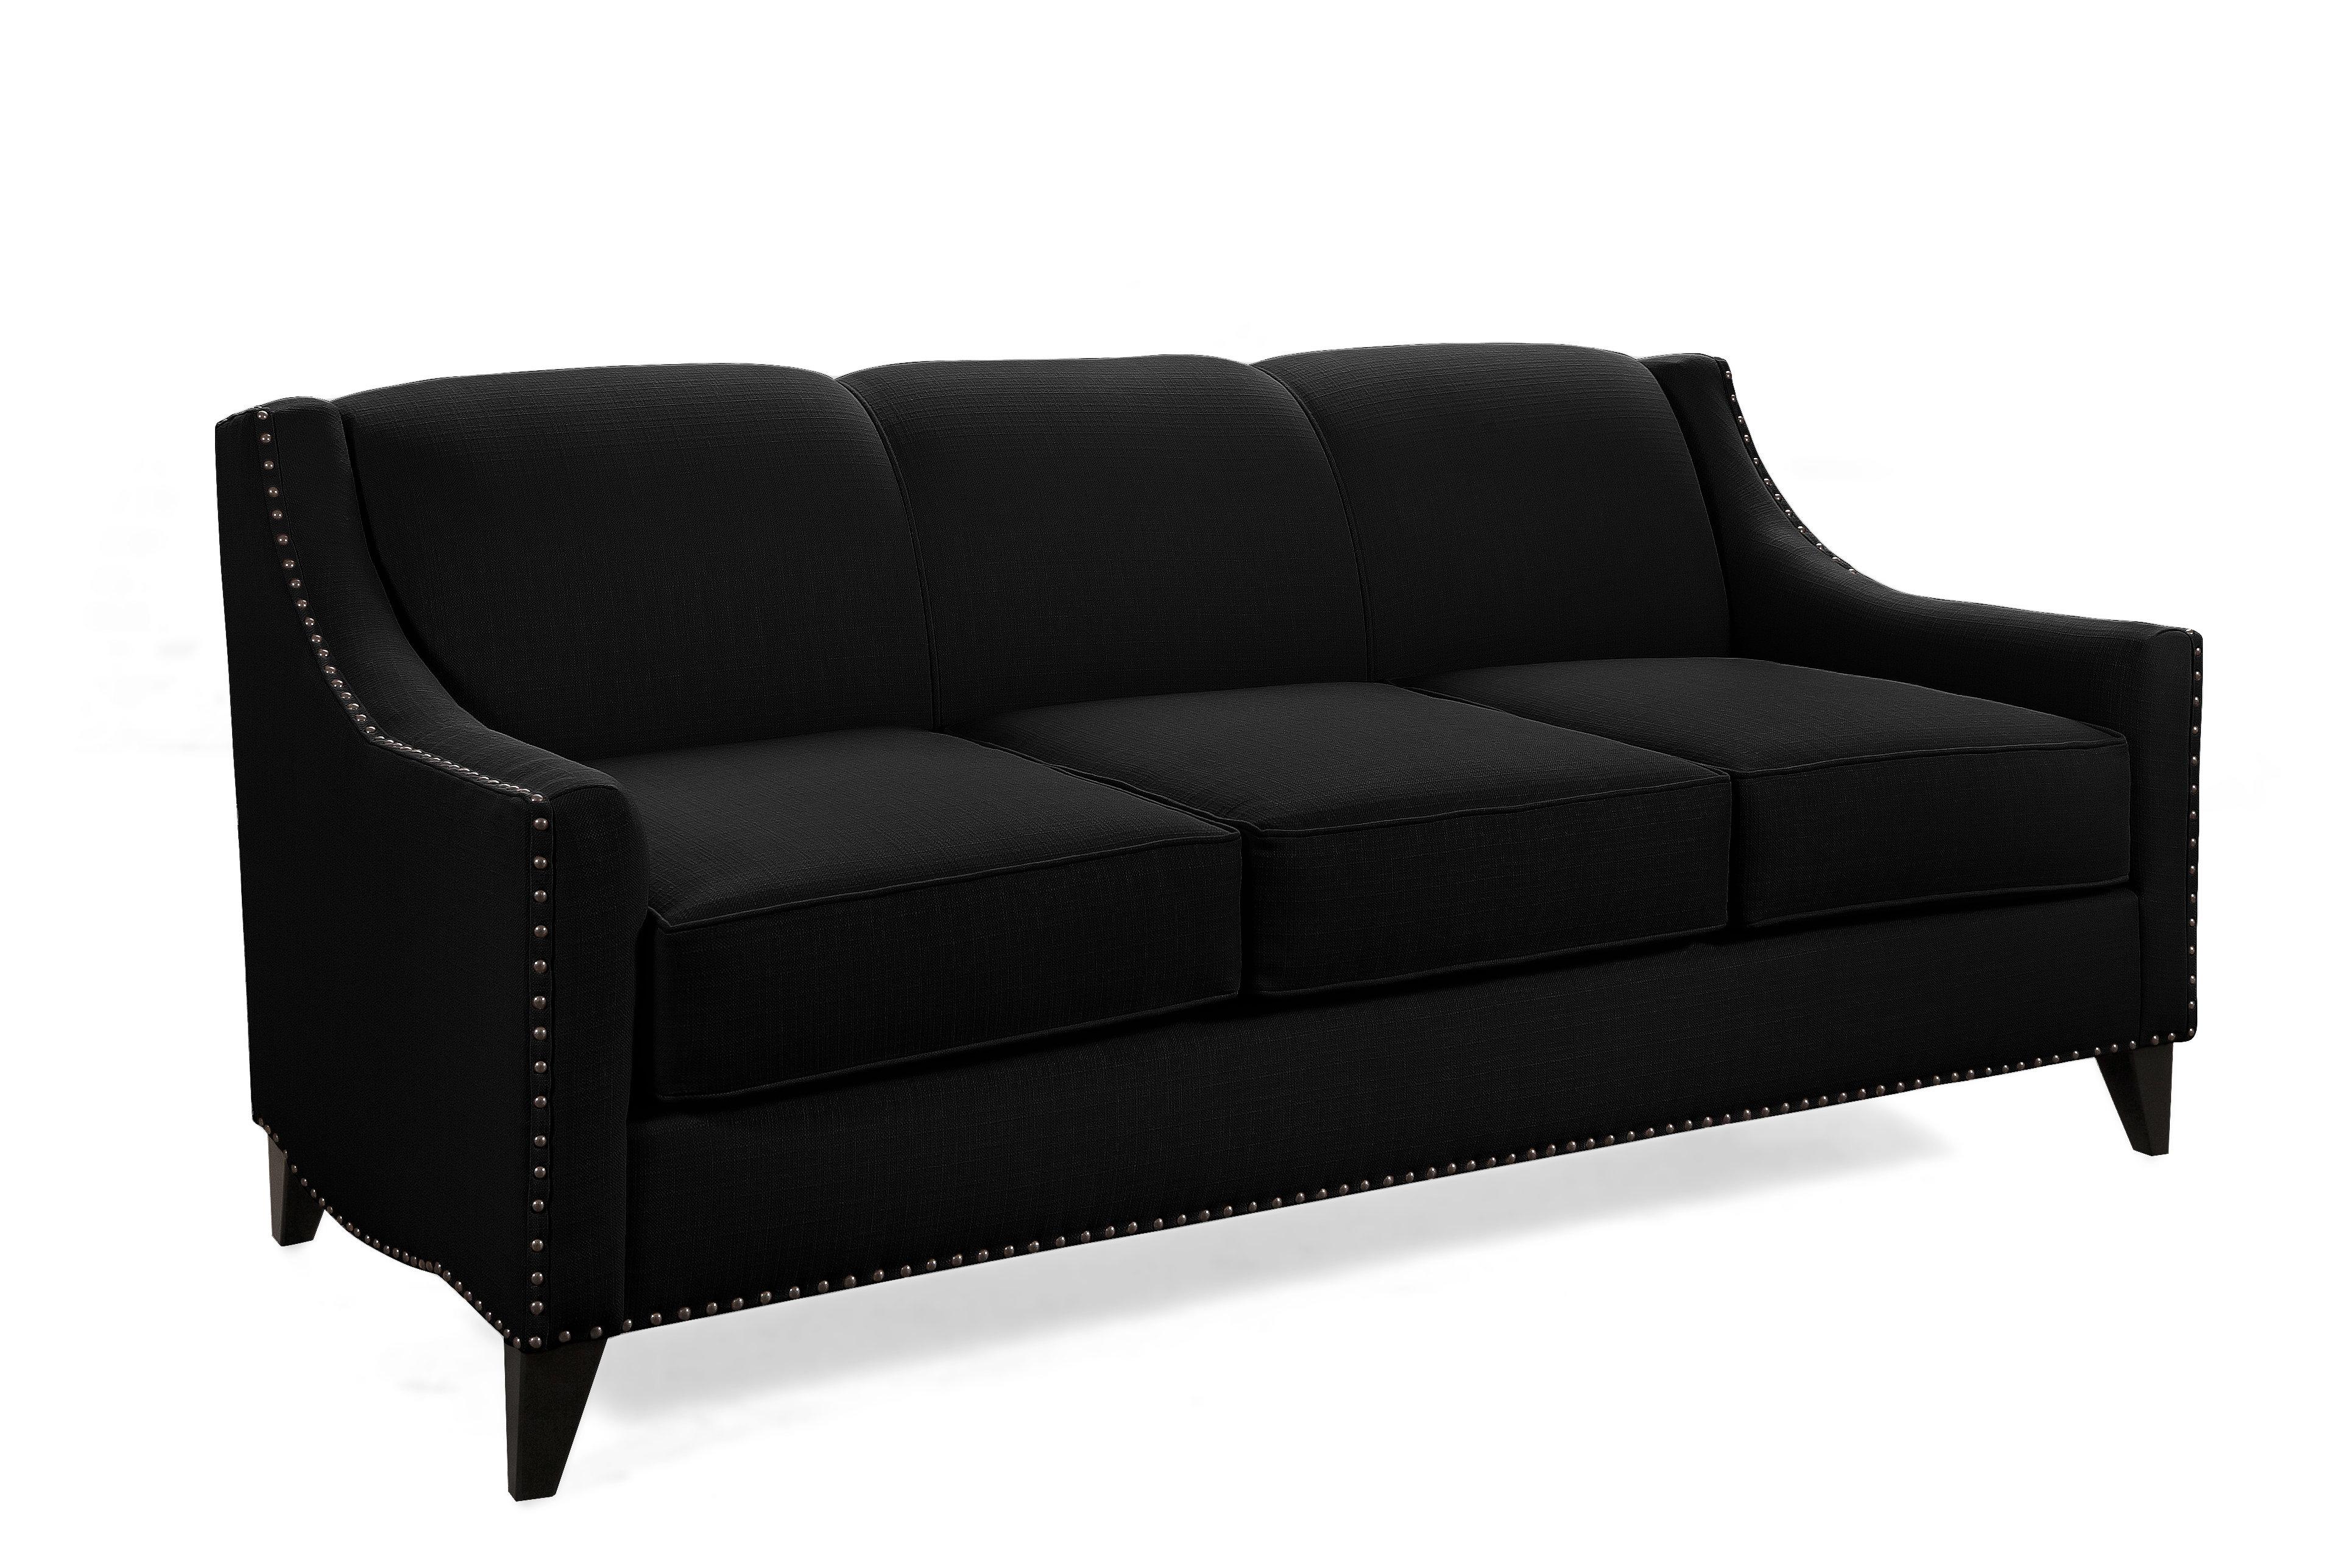 Loni M Designs Cameron Sofa | Wayfair Regarding Cameron Sofa Chairs (View 2 of 25)